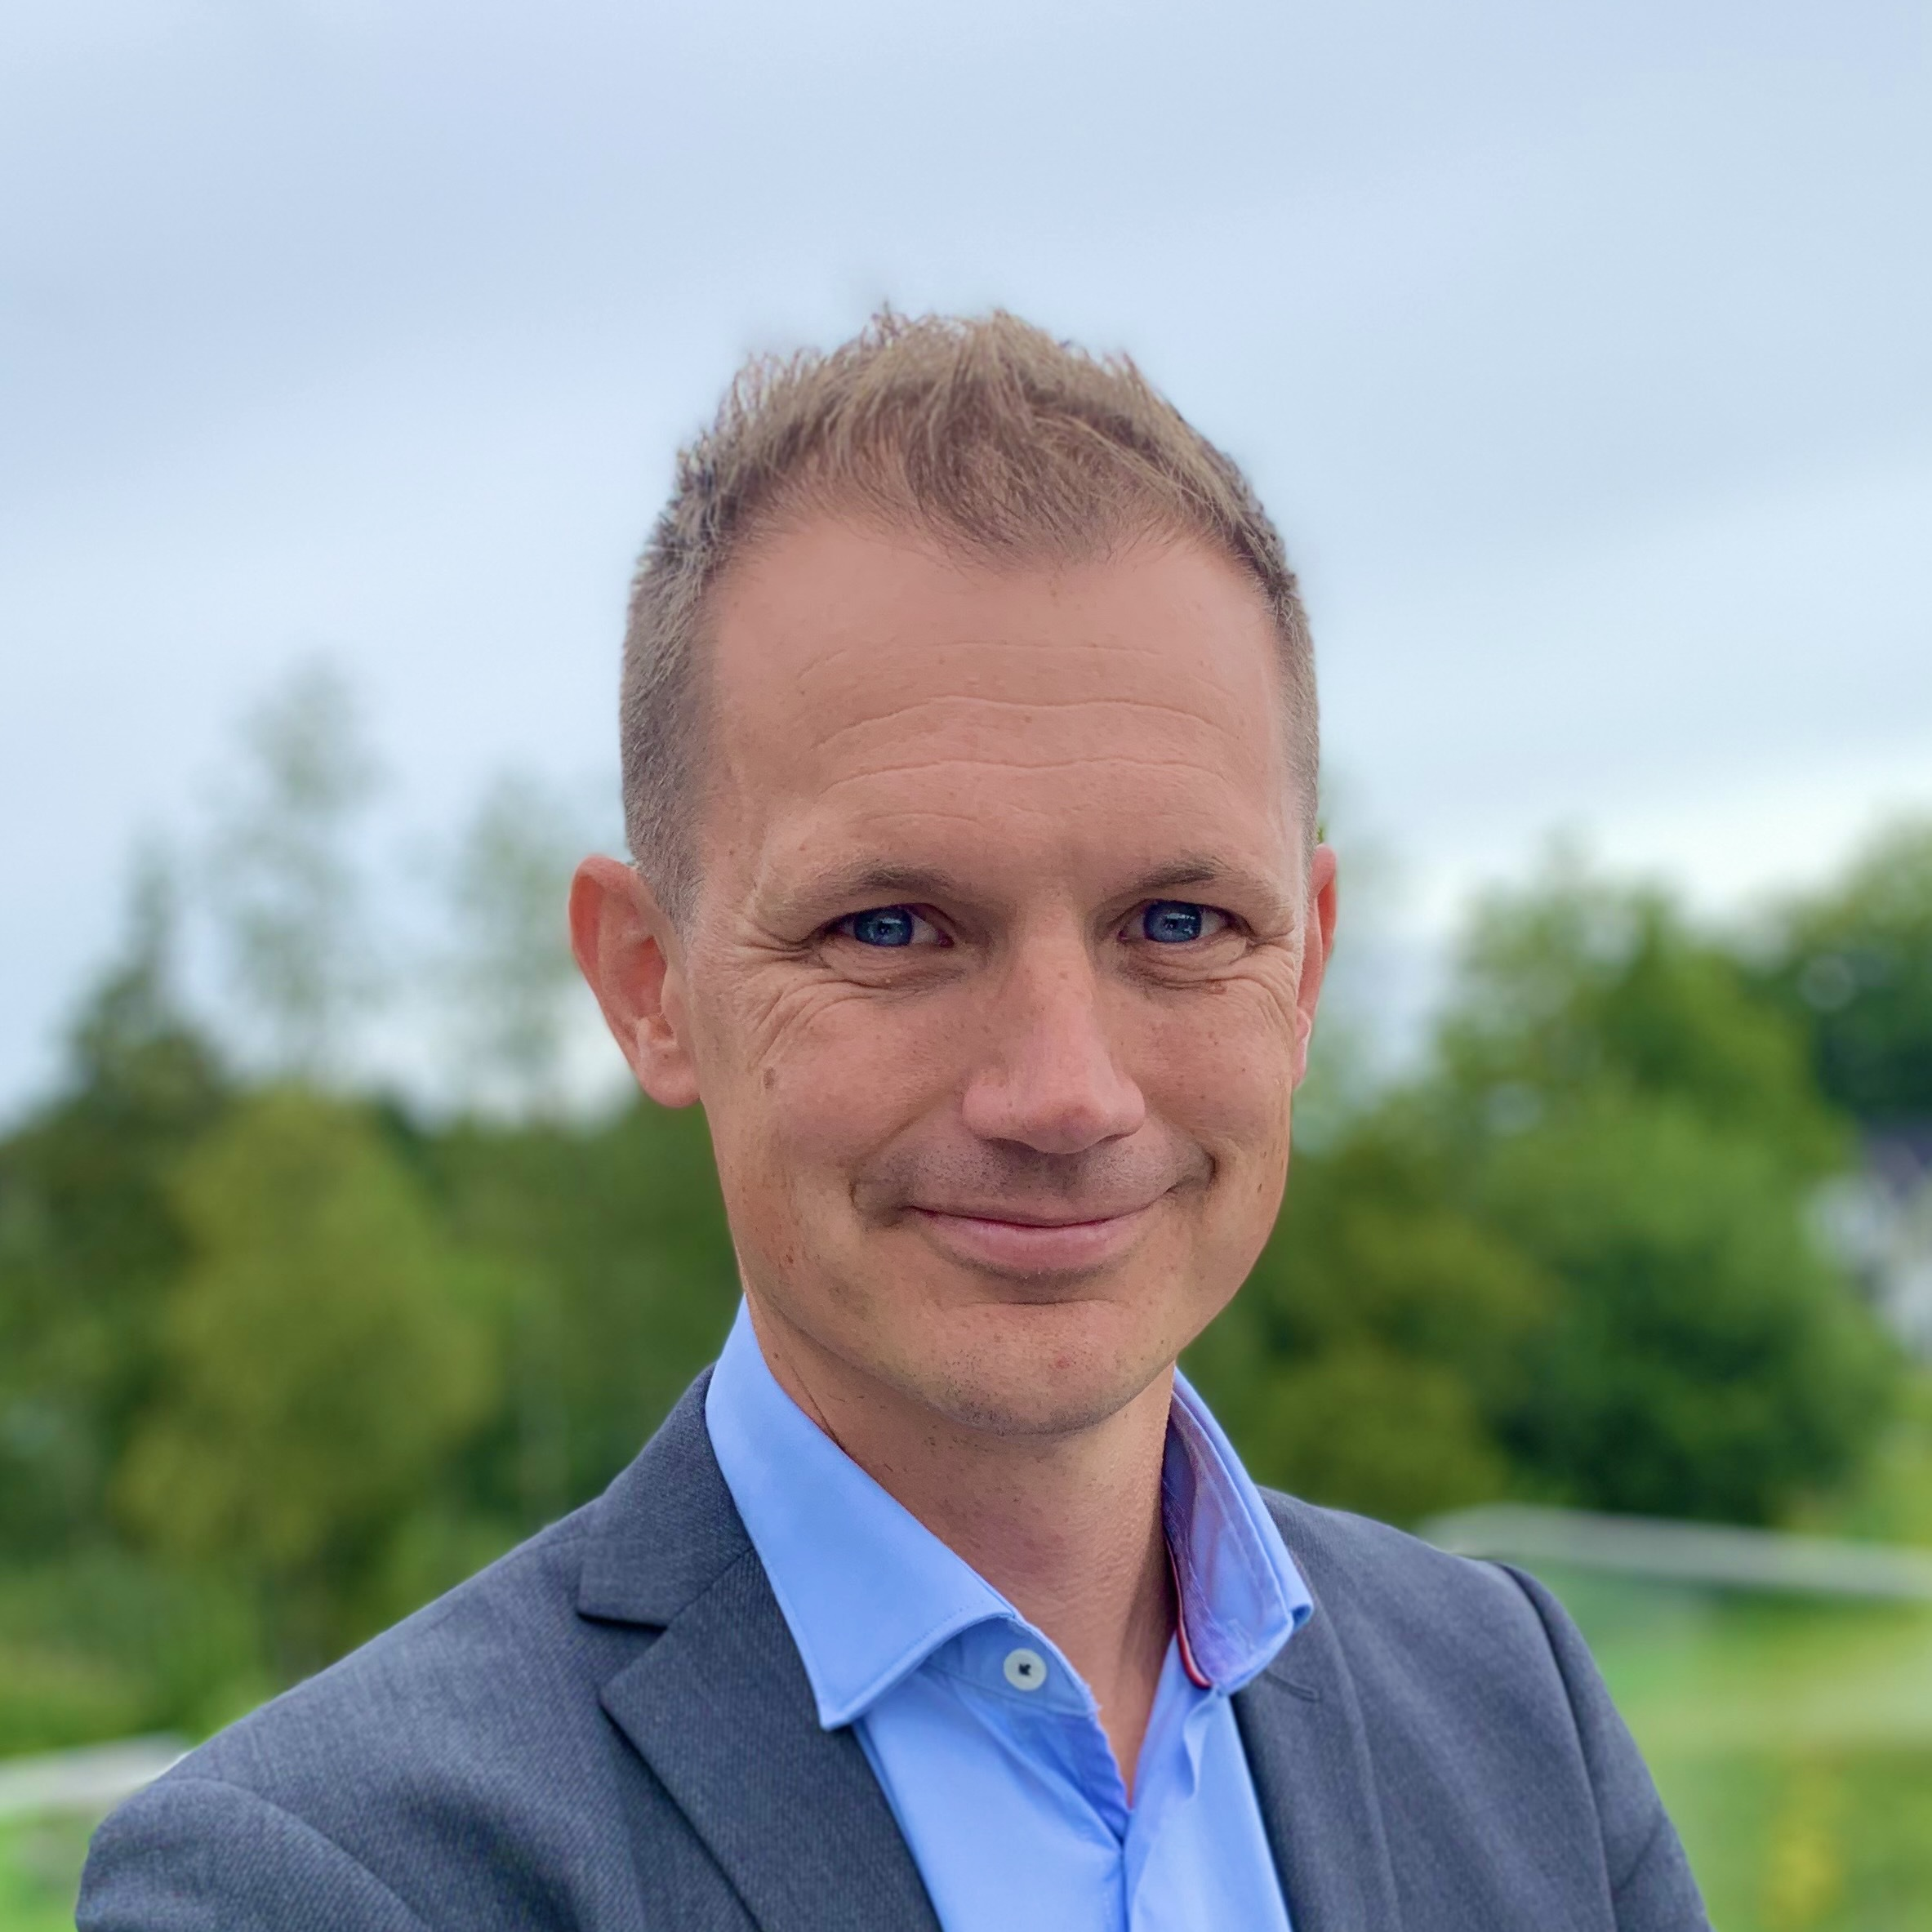 Peter Rank Larsen